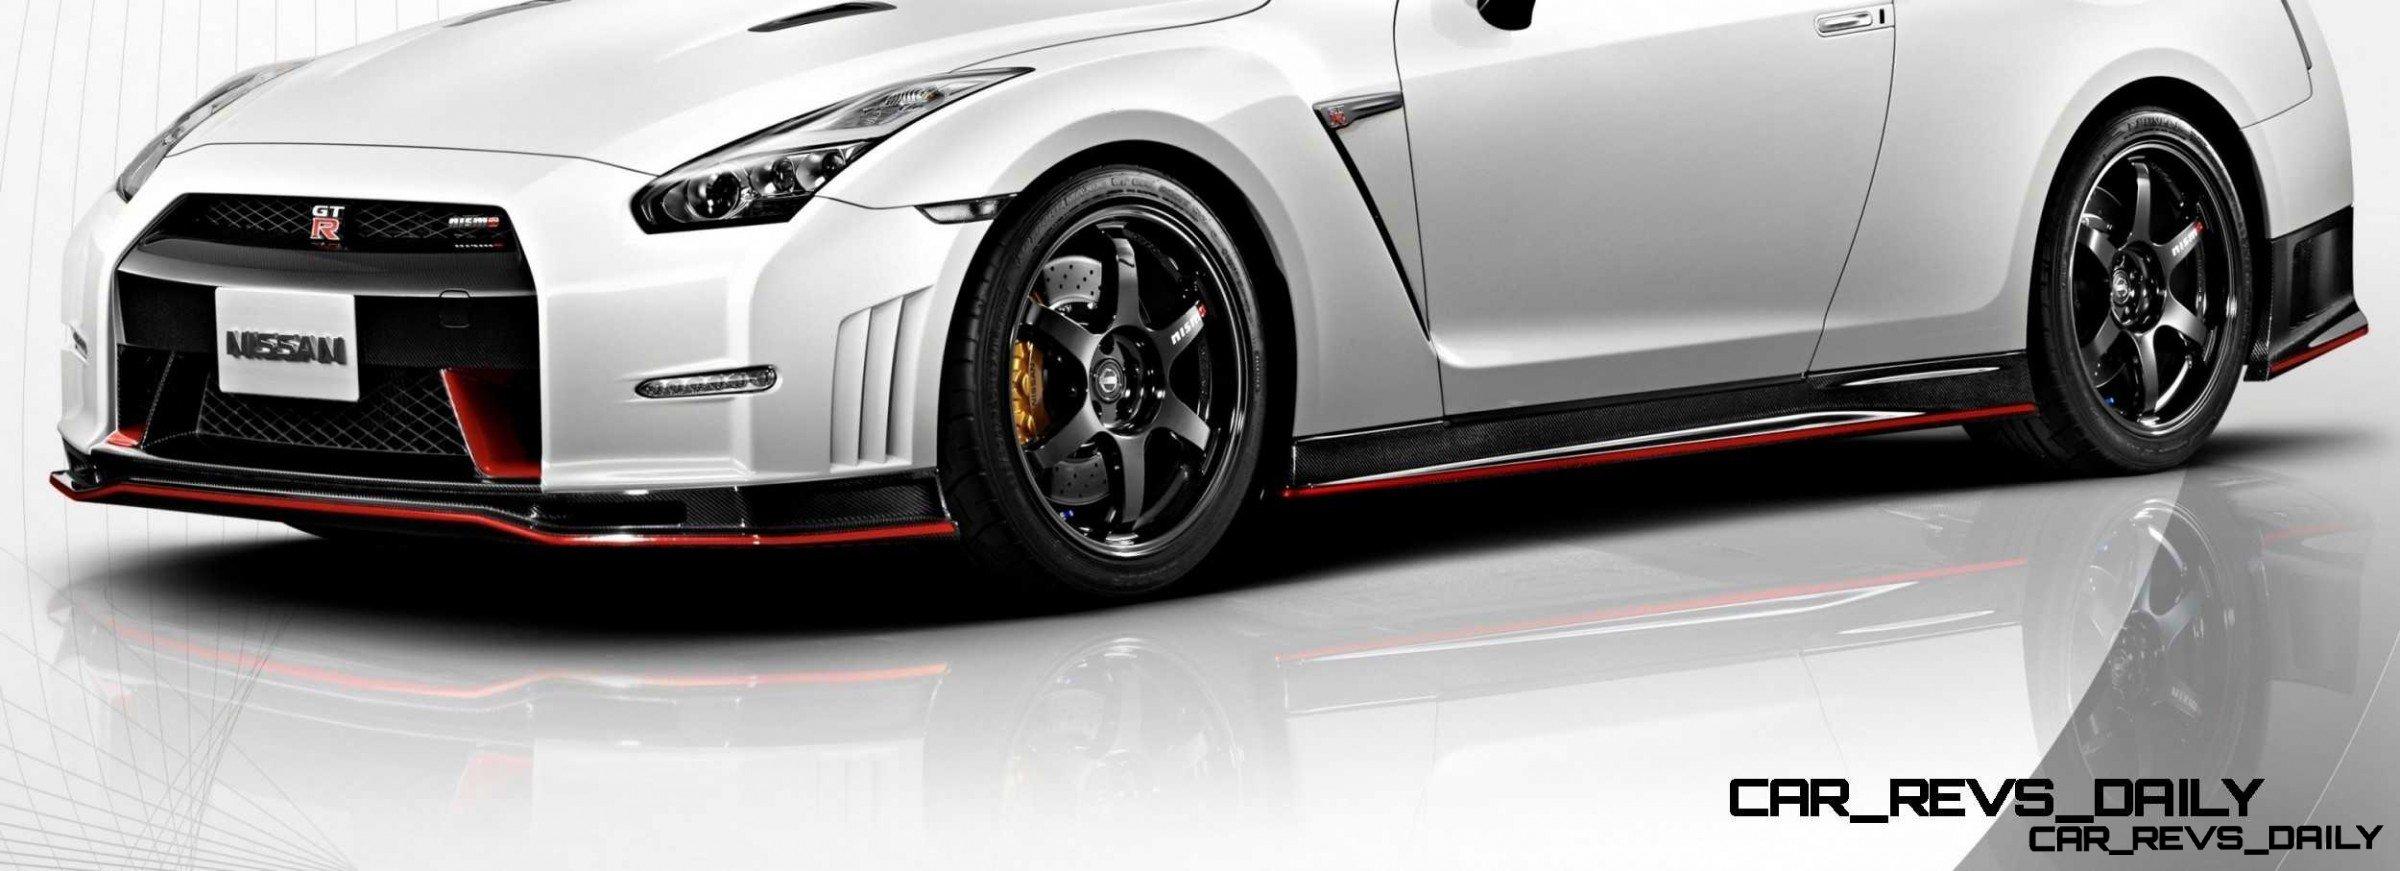 12 2014 Nissan GTR NISMO Brings FutureTech and 600 Horsepower